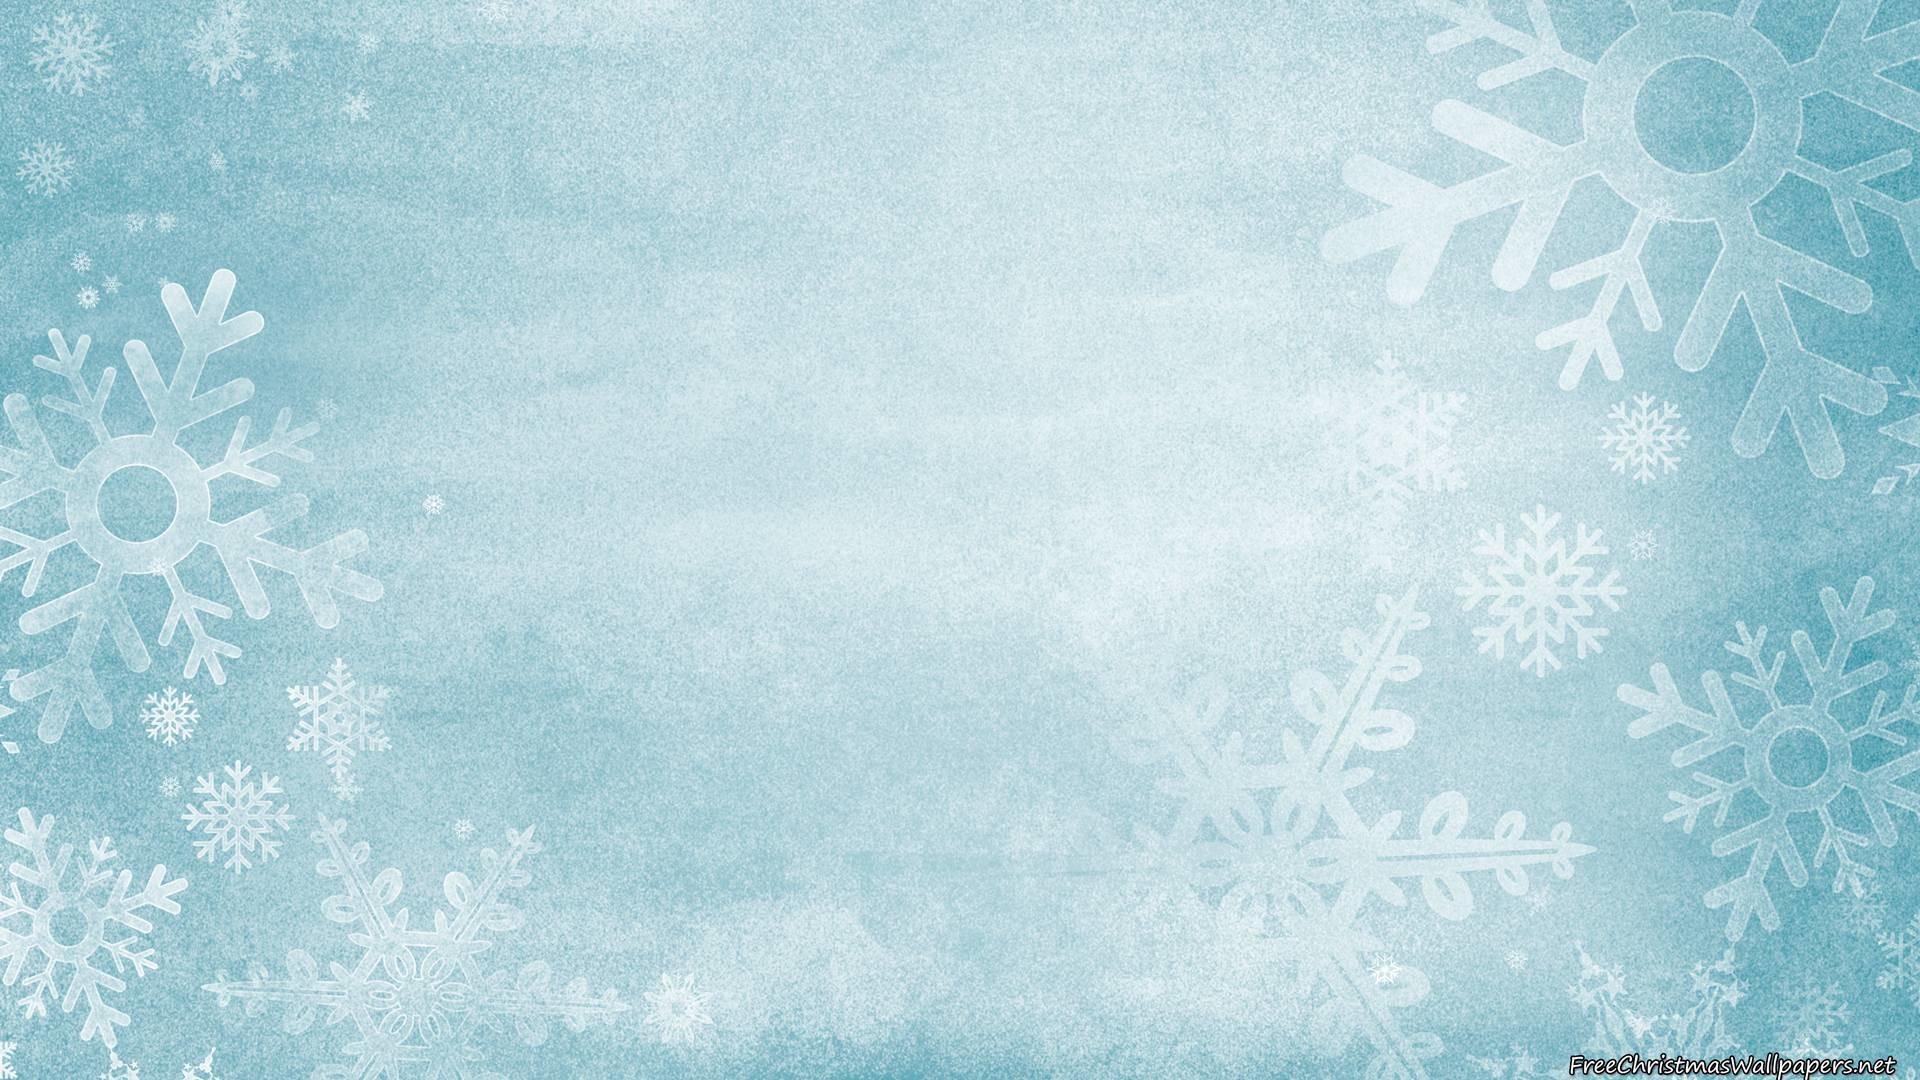 Frozen Christmas Background Wallpaper